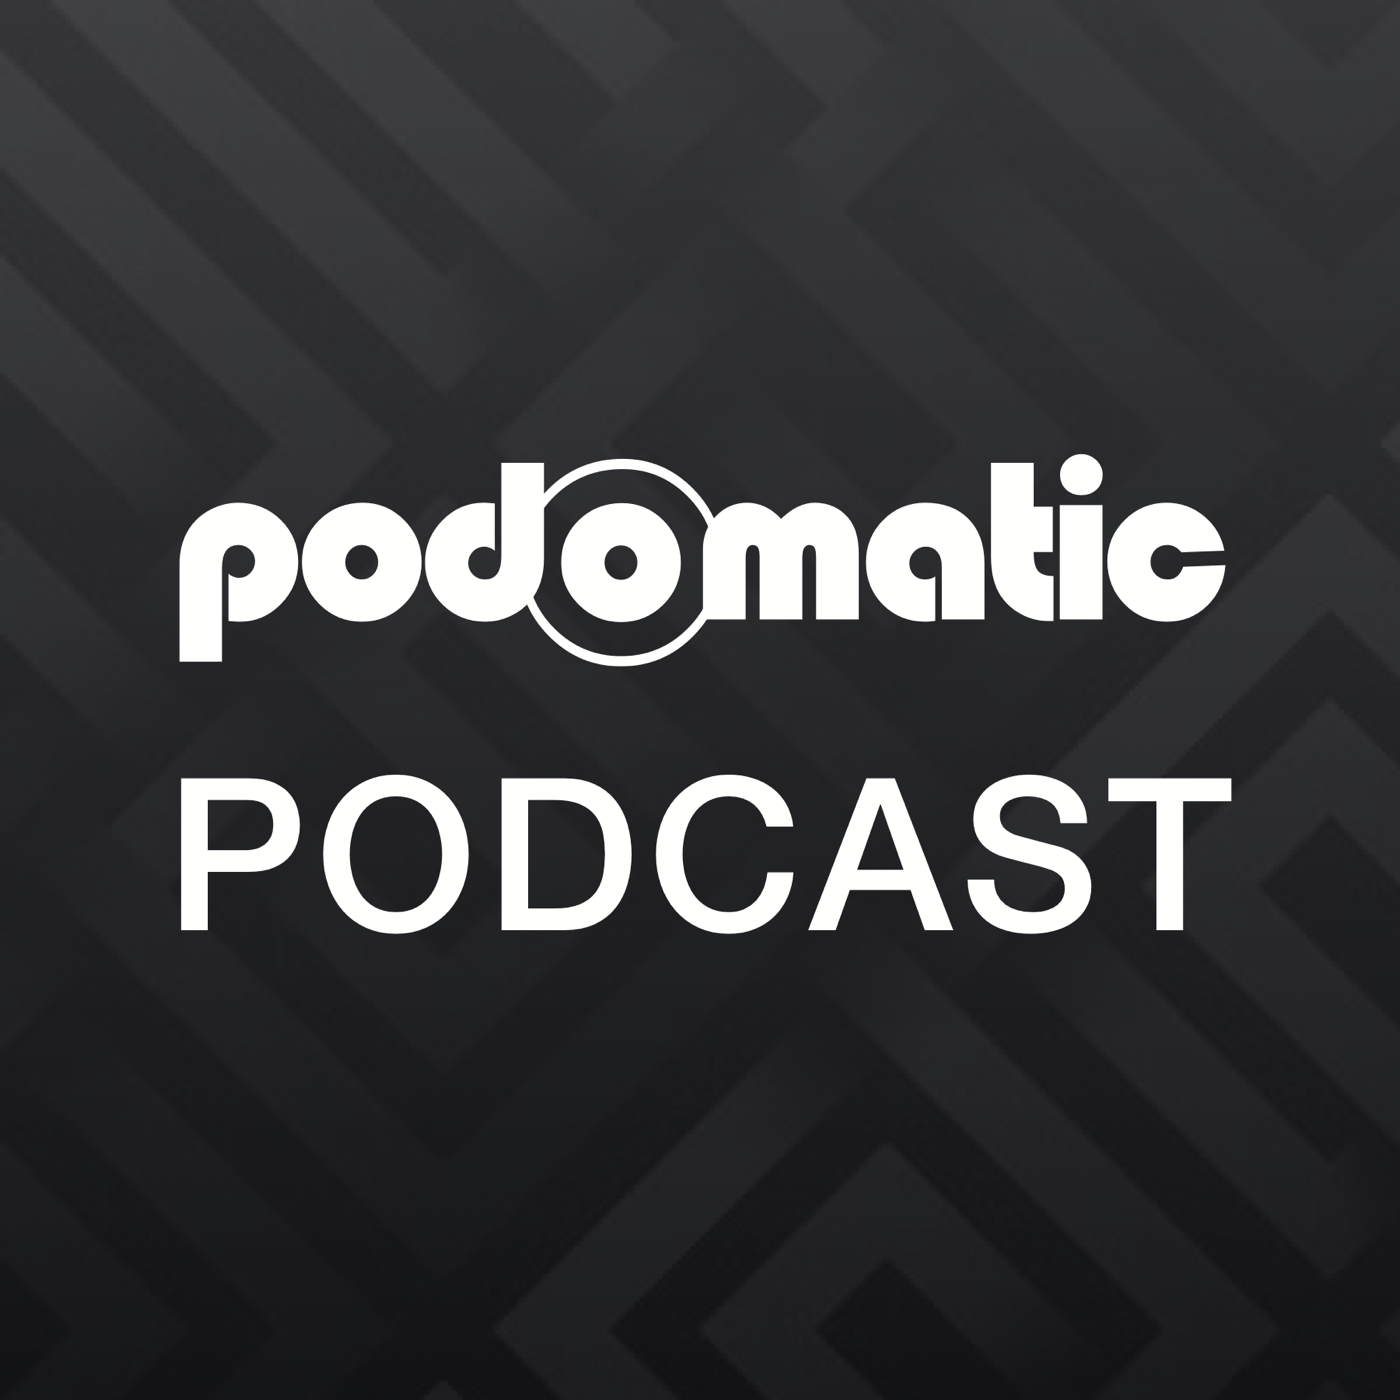 jack crise's Podcast